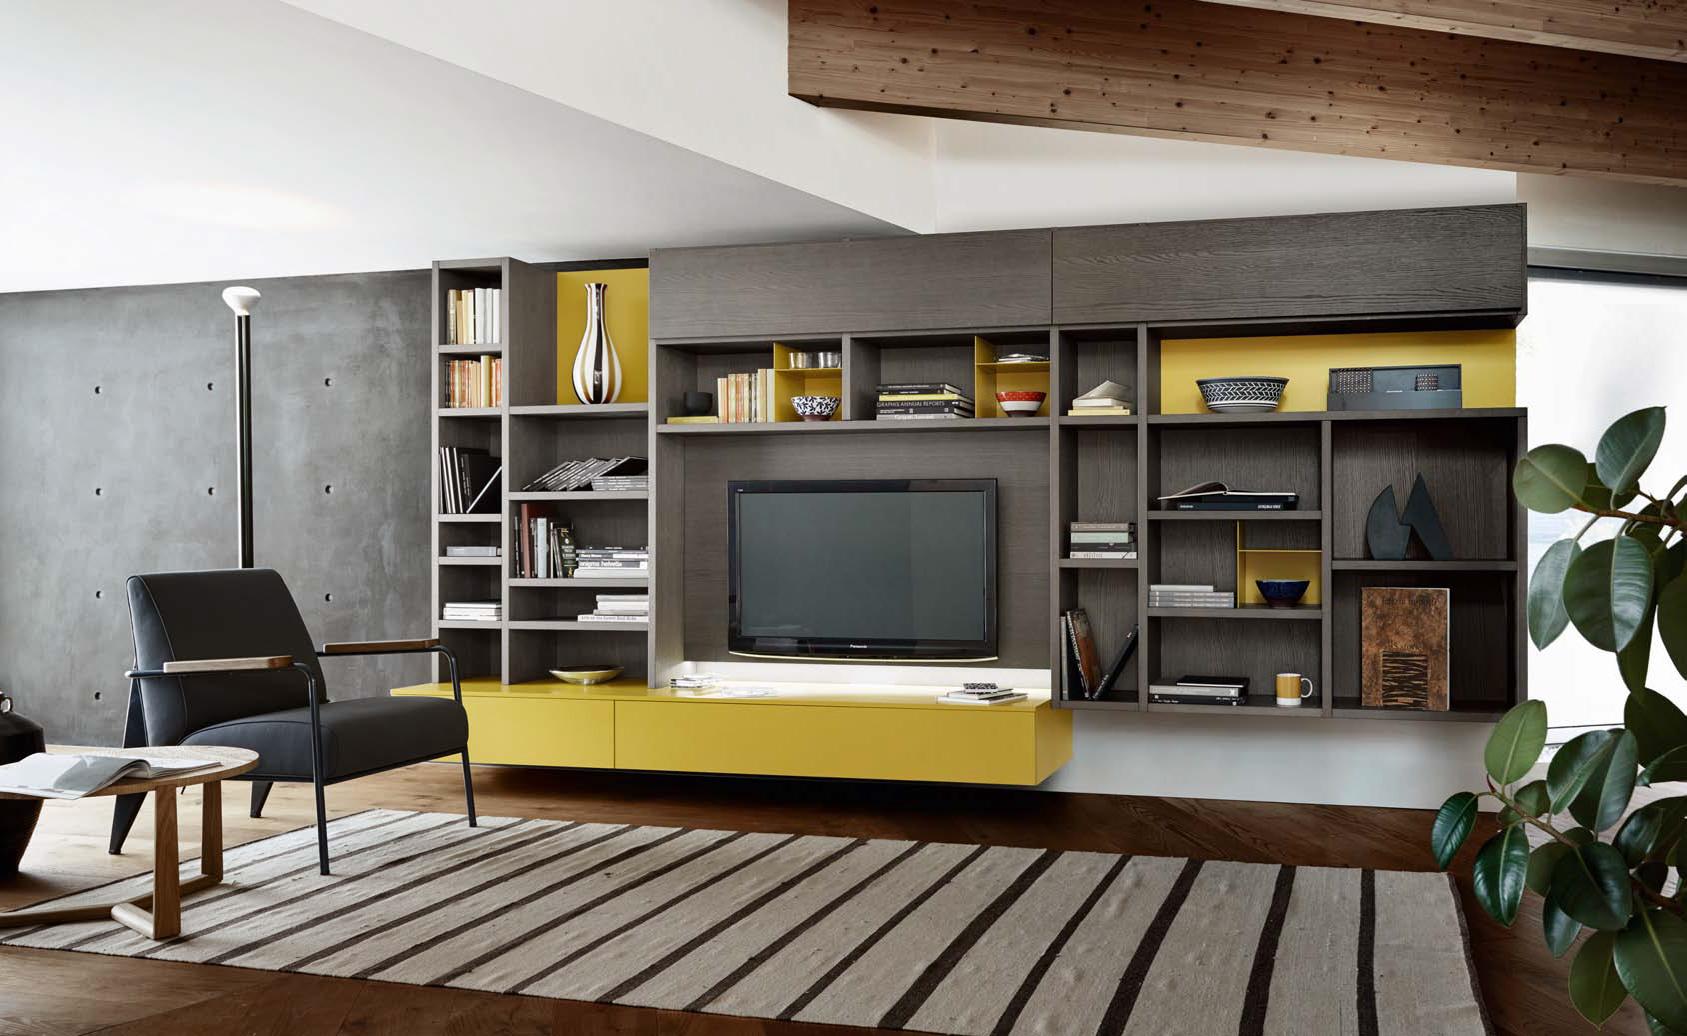 Modo libreria san giacomo centro mobili - Mobili san giacomo prezzi ...